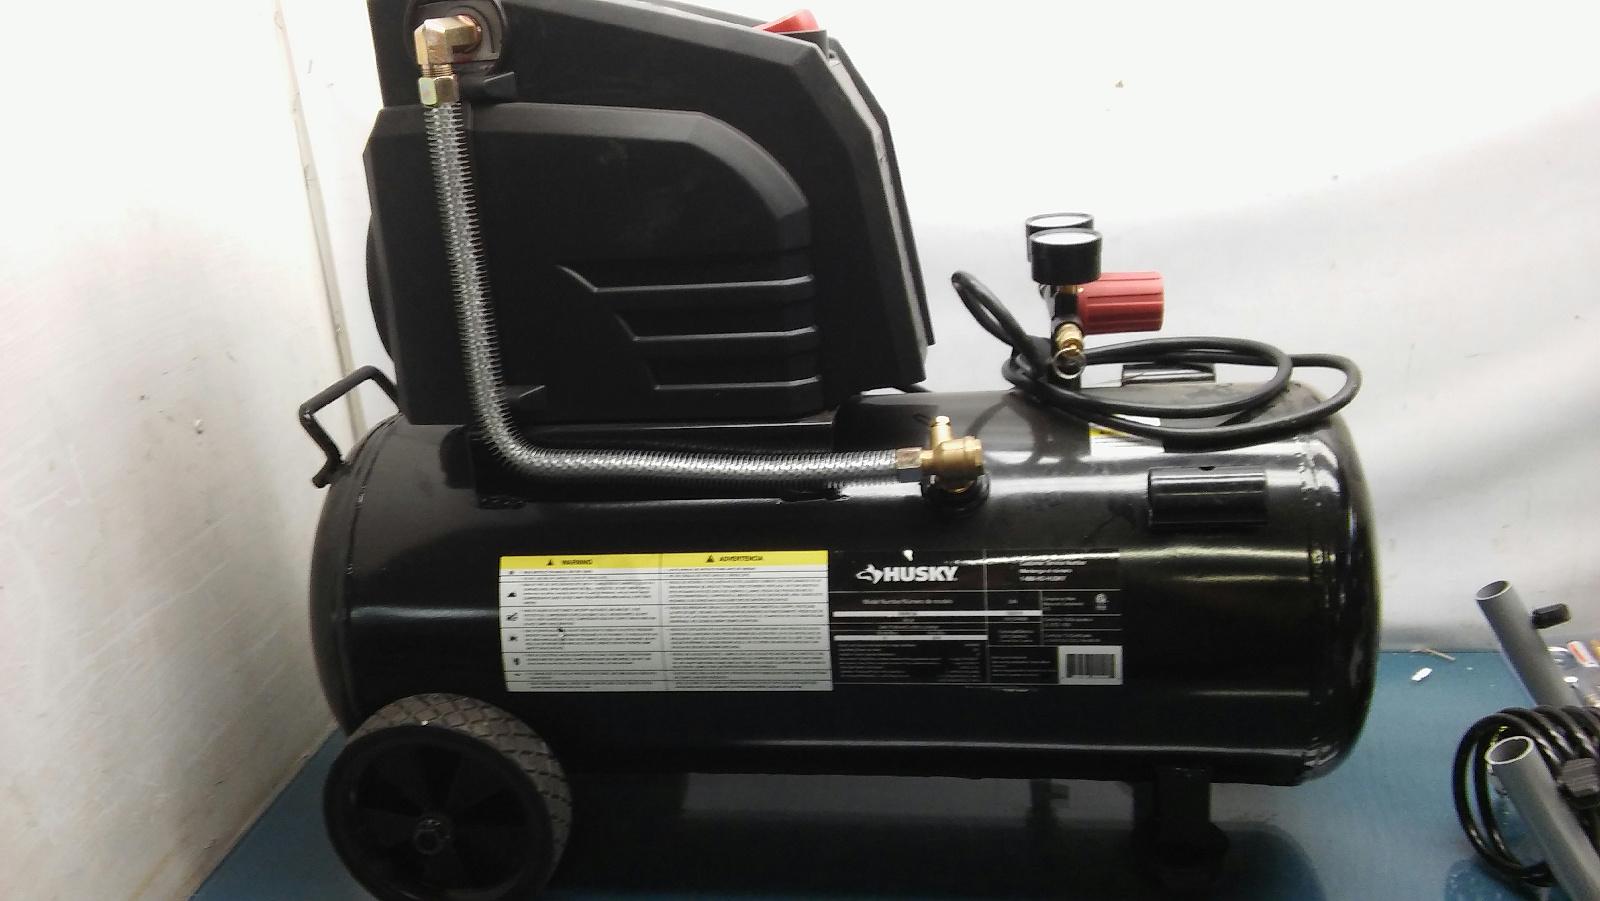 Husky 8 Gallon Oil Free Portable Air Compressor Tool Model Manual Guide